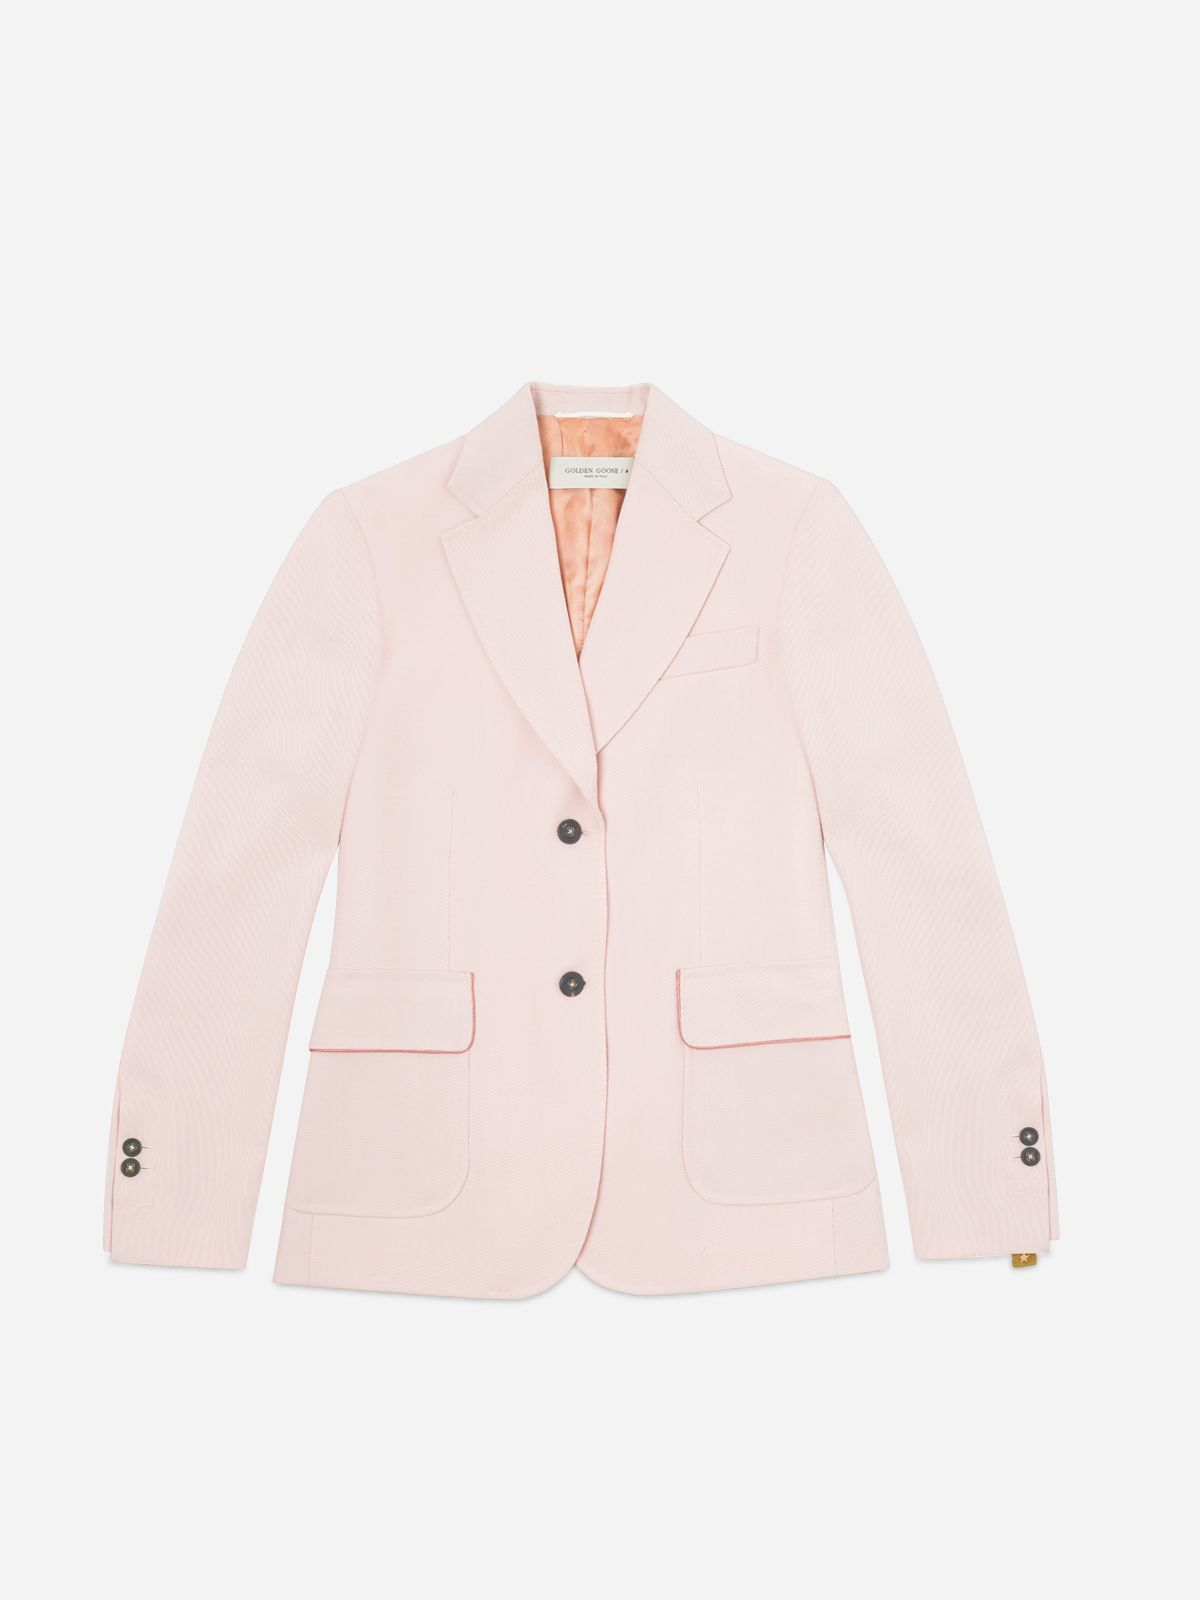 Golden Goose - Blazer Annachiara in twill di lana vergine rosa in